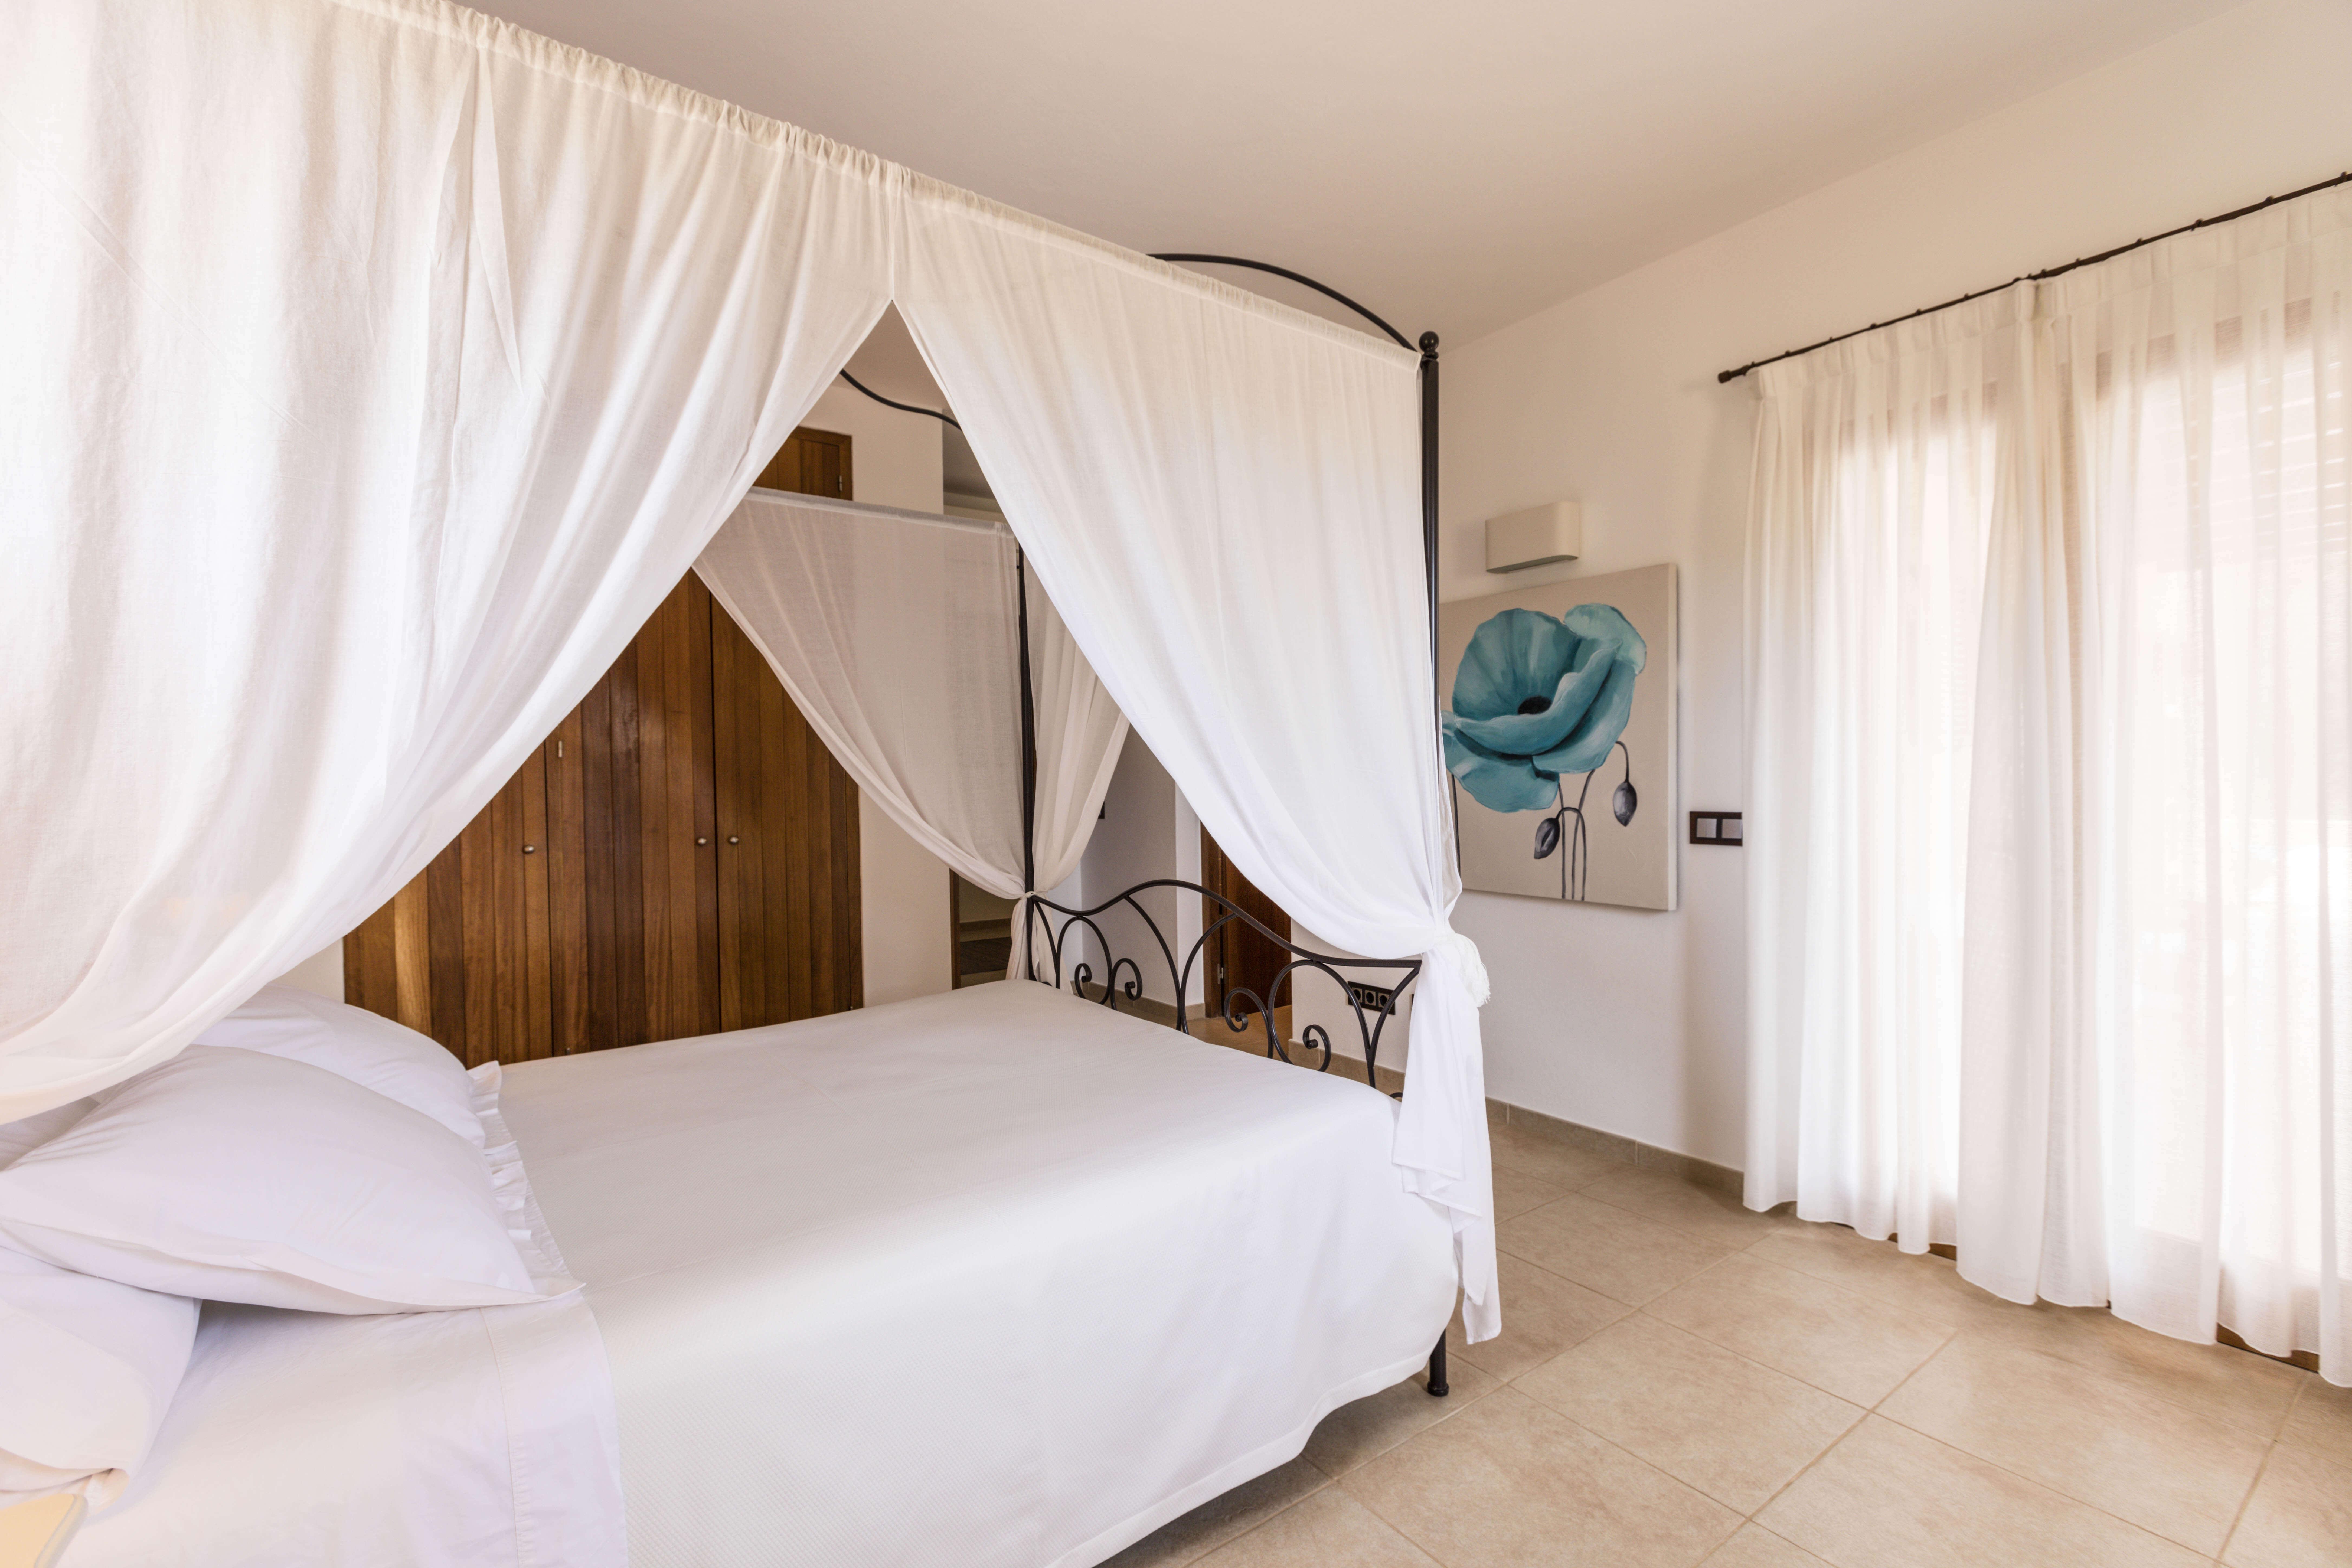 Habitación con terraza privada villa Can Cardona. Alojamientos turísticos Cardona